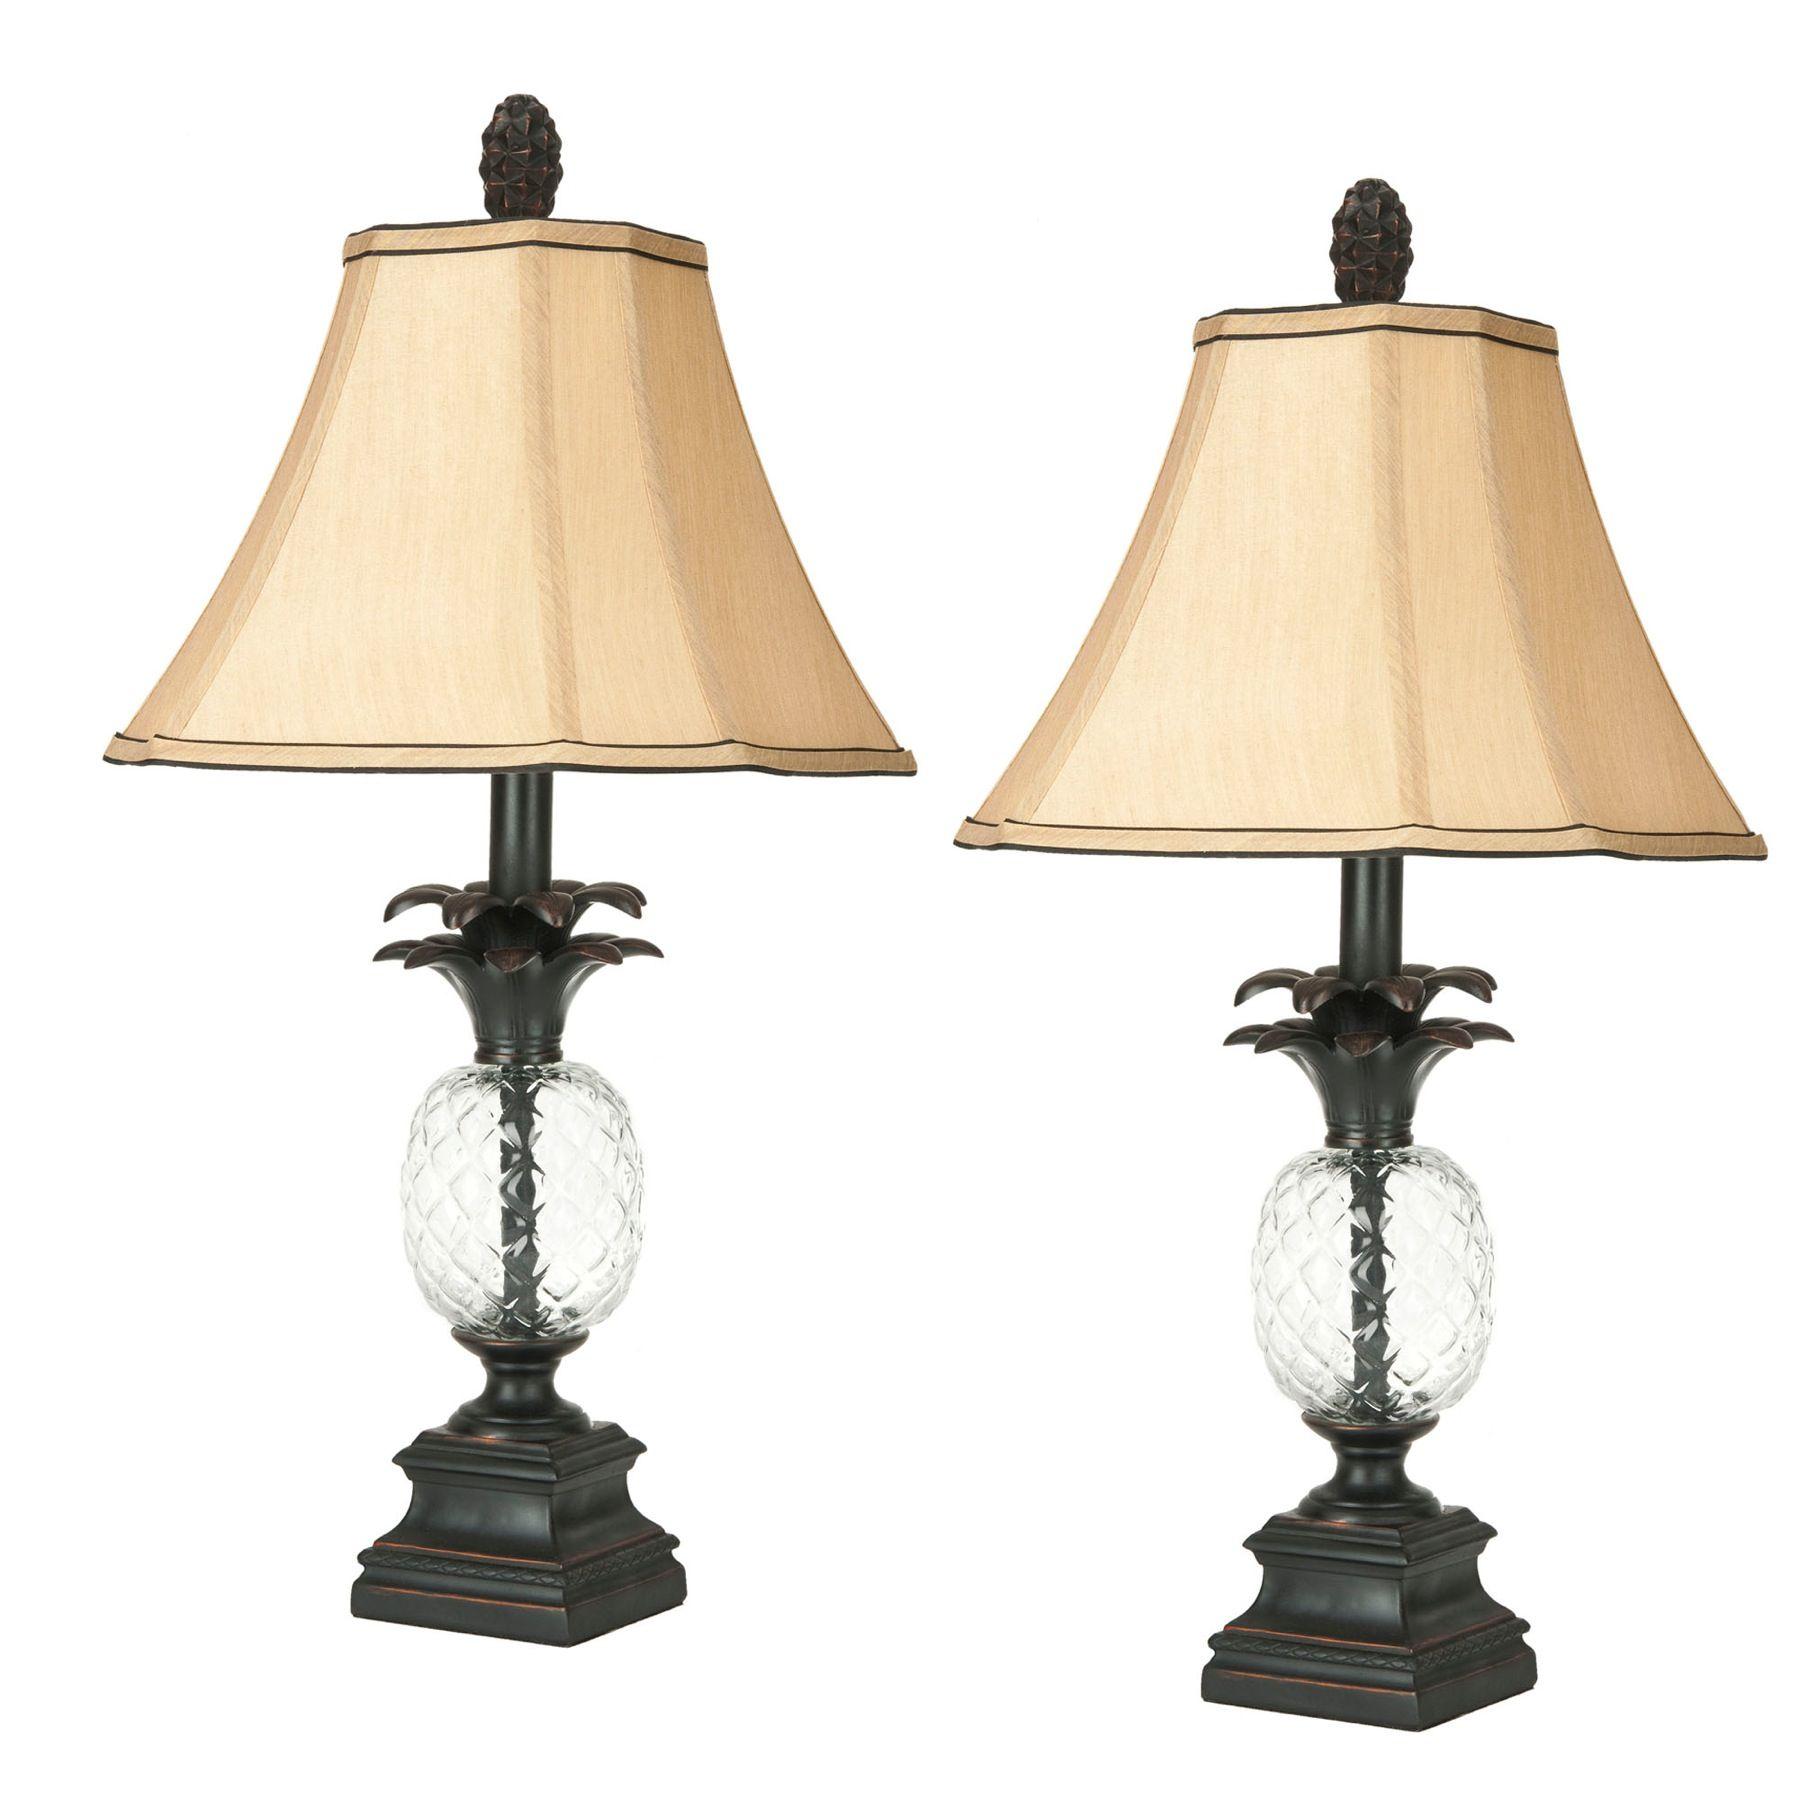 Safavieh Alanna Glass Pineapple Lamp Clear Pineapple Lamp